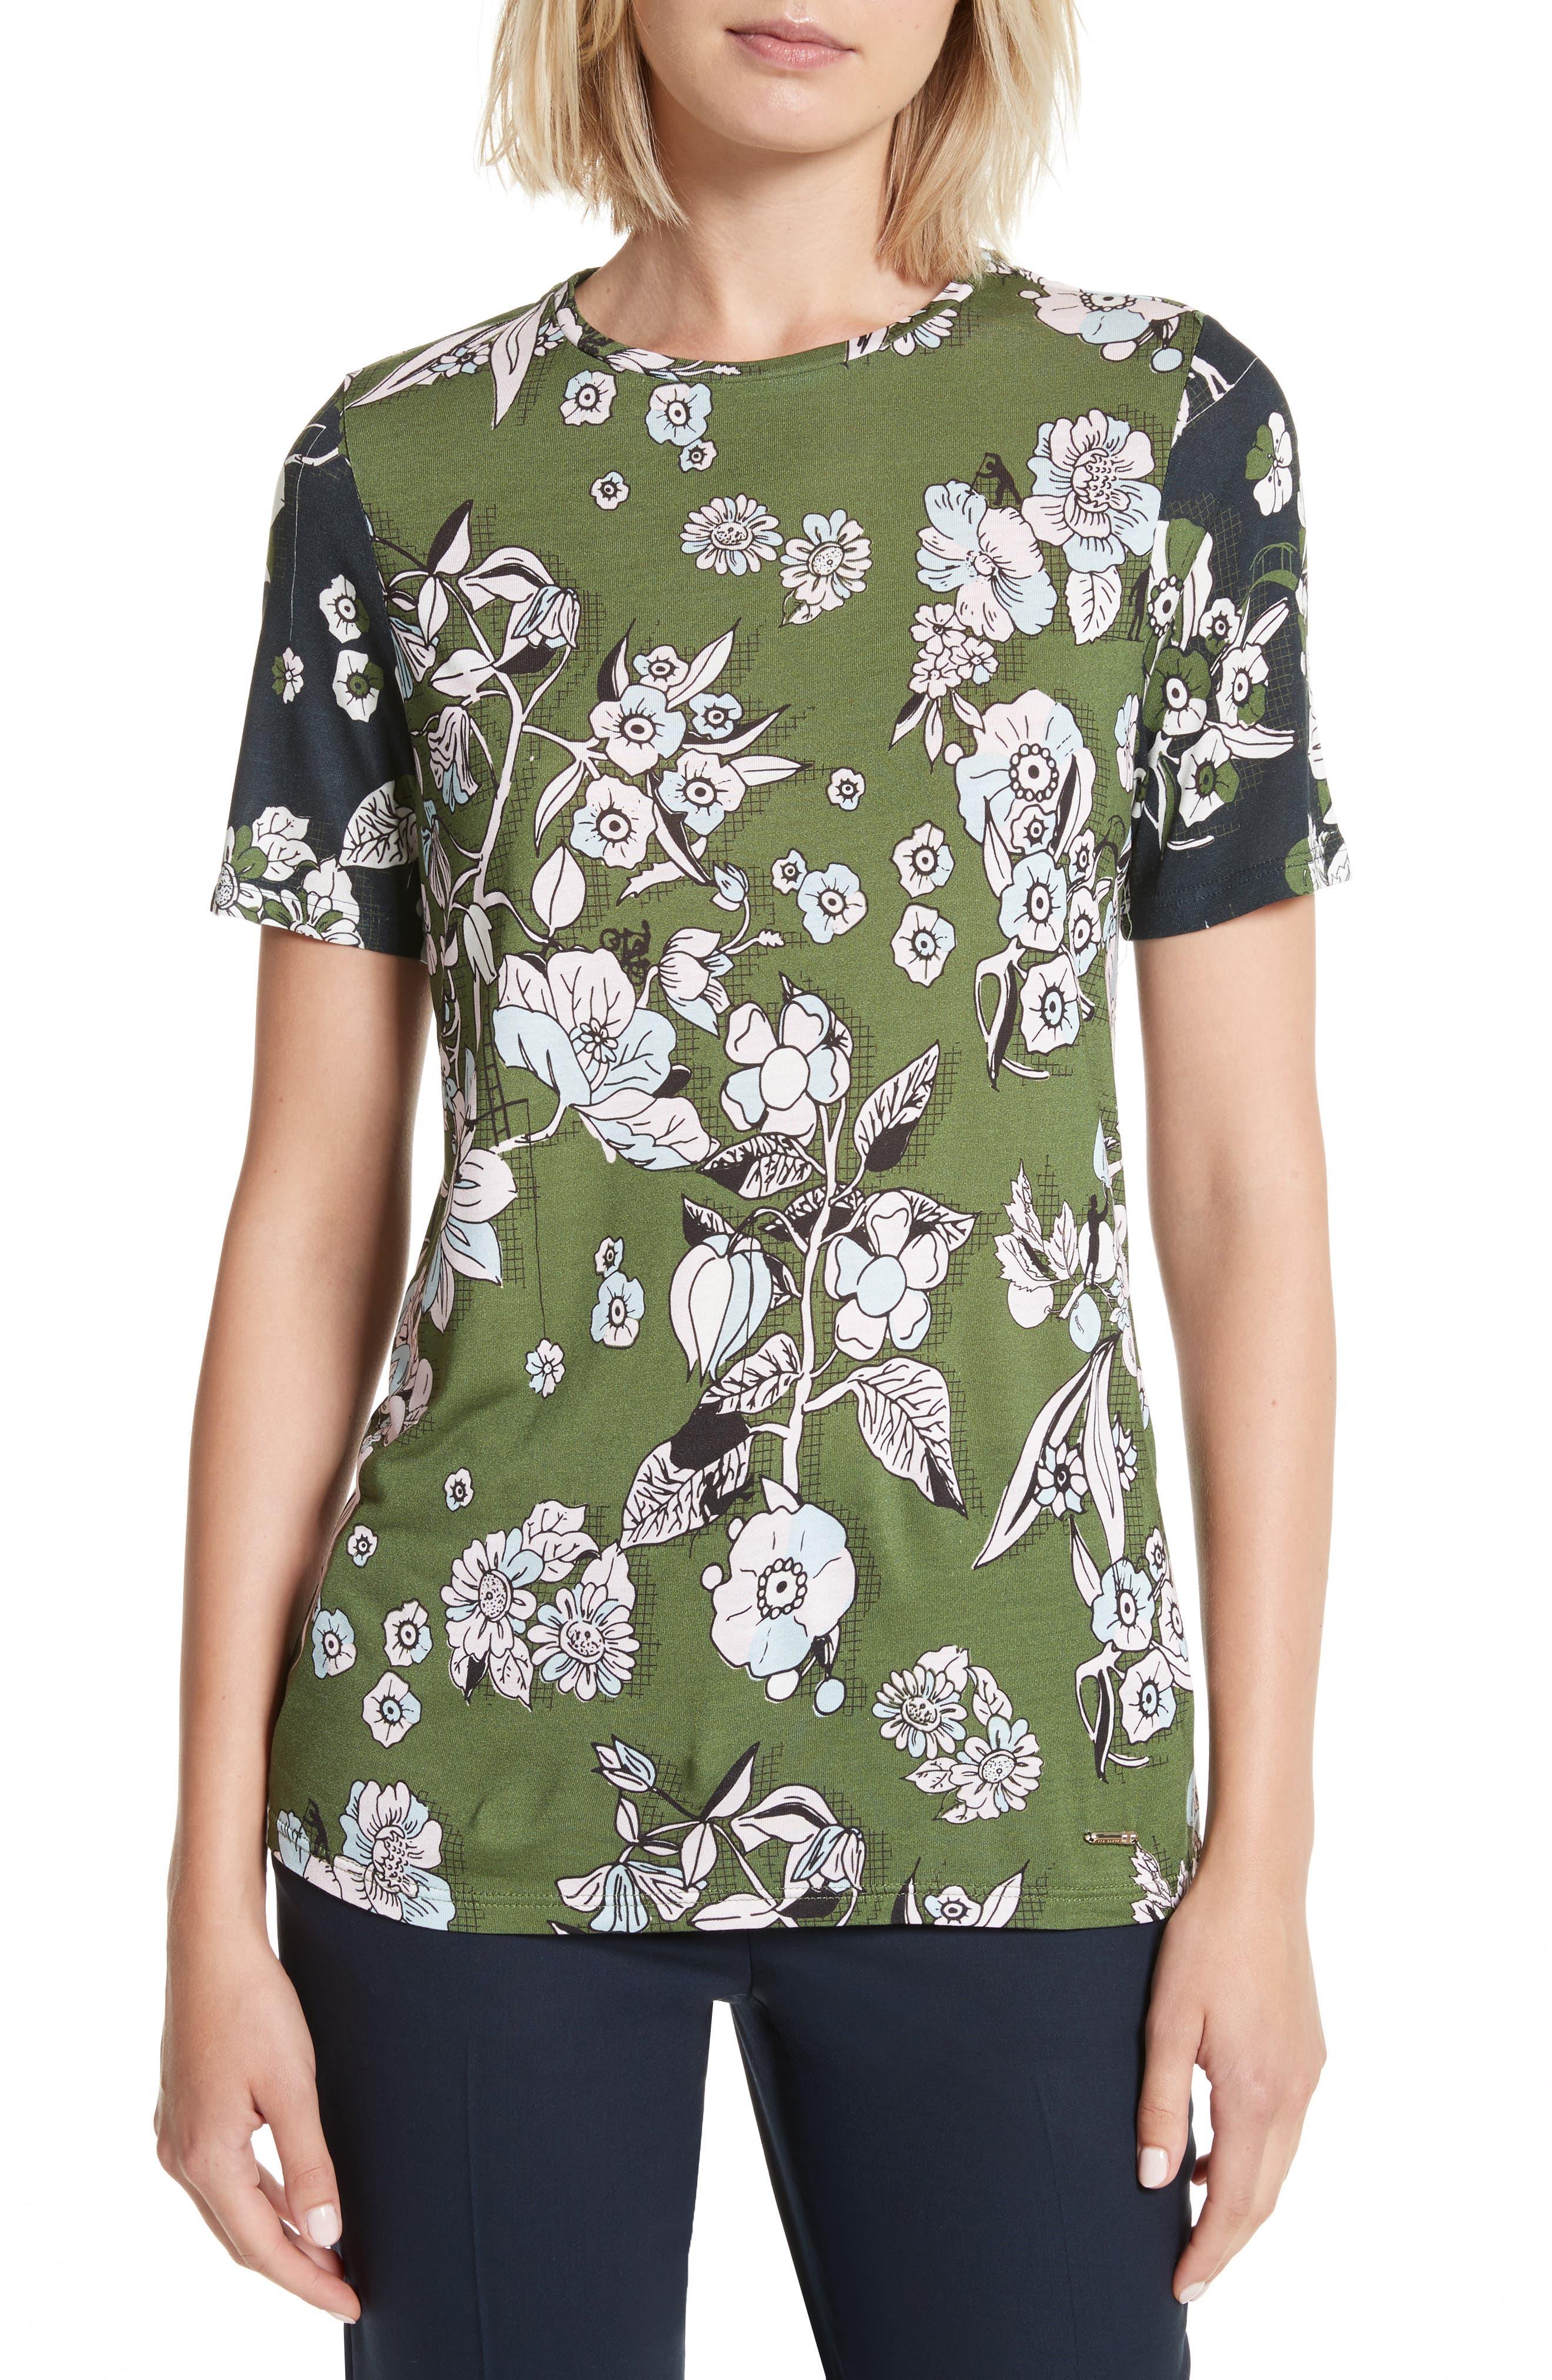 Alternate Image 1 Selected - Ted Baker London Adren Floral Print Tee